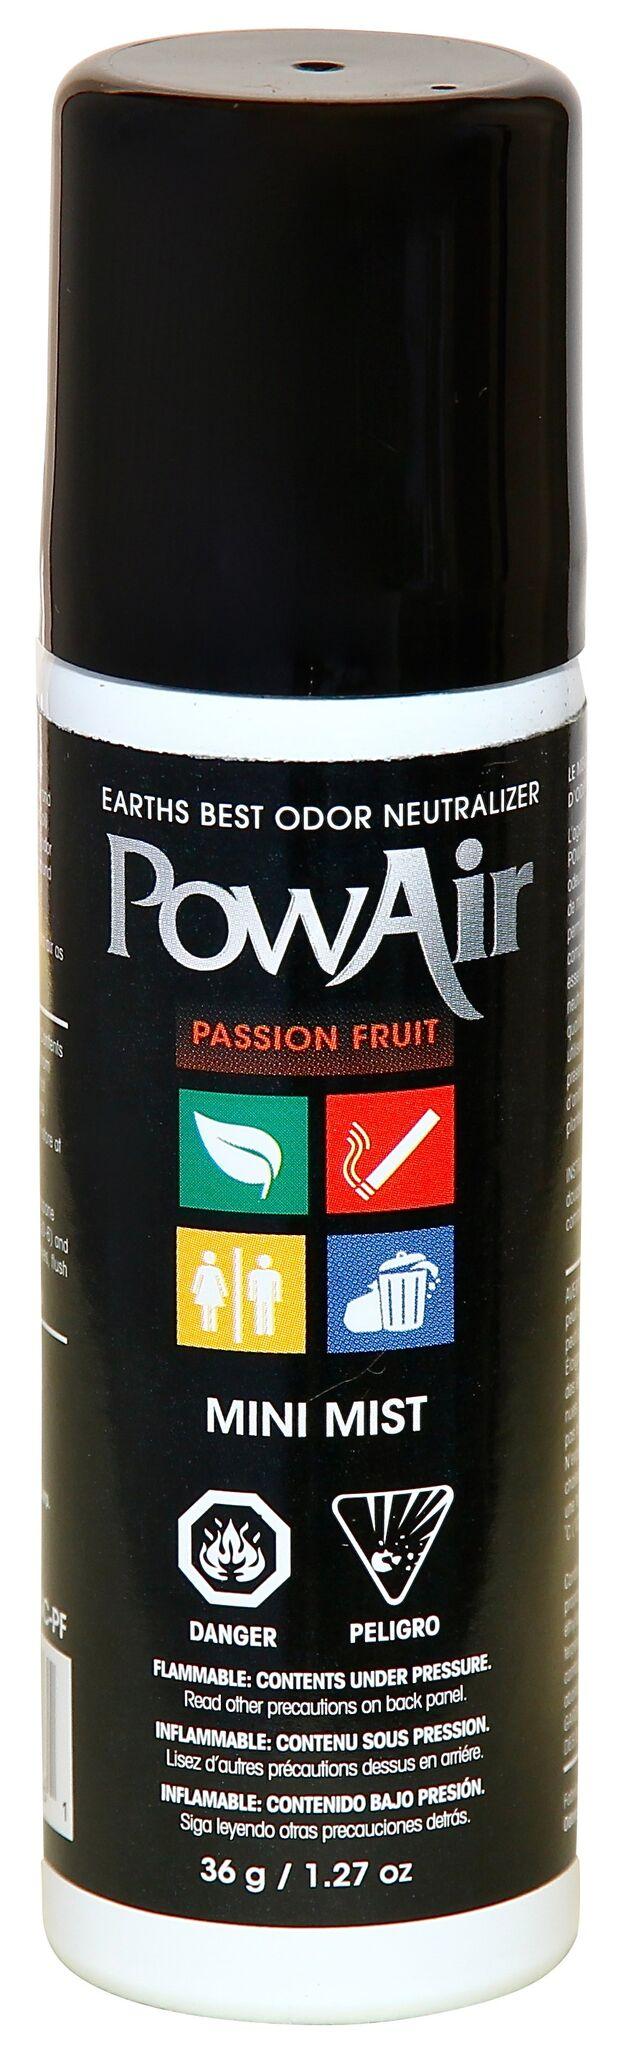 Powair Minimist Passion Fruit 36 g